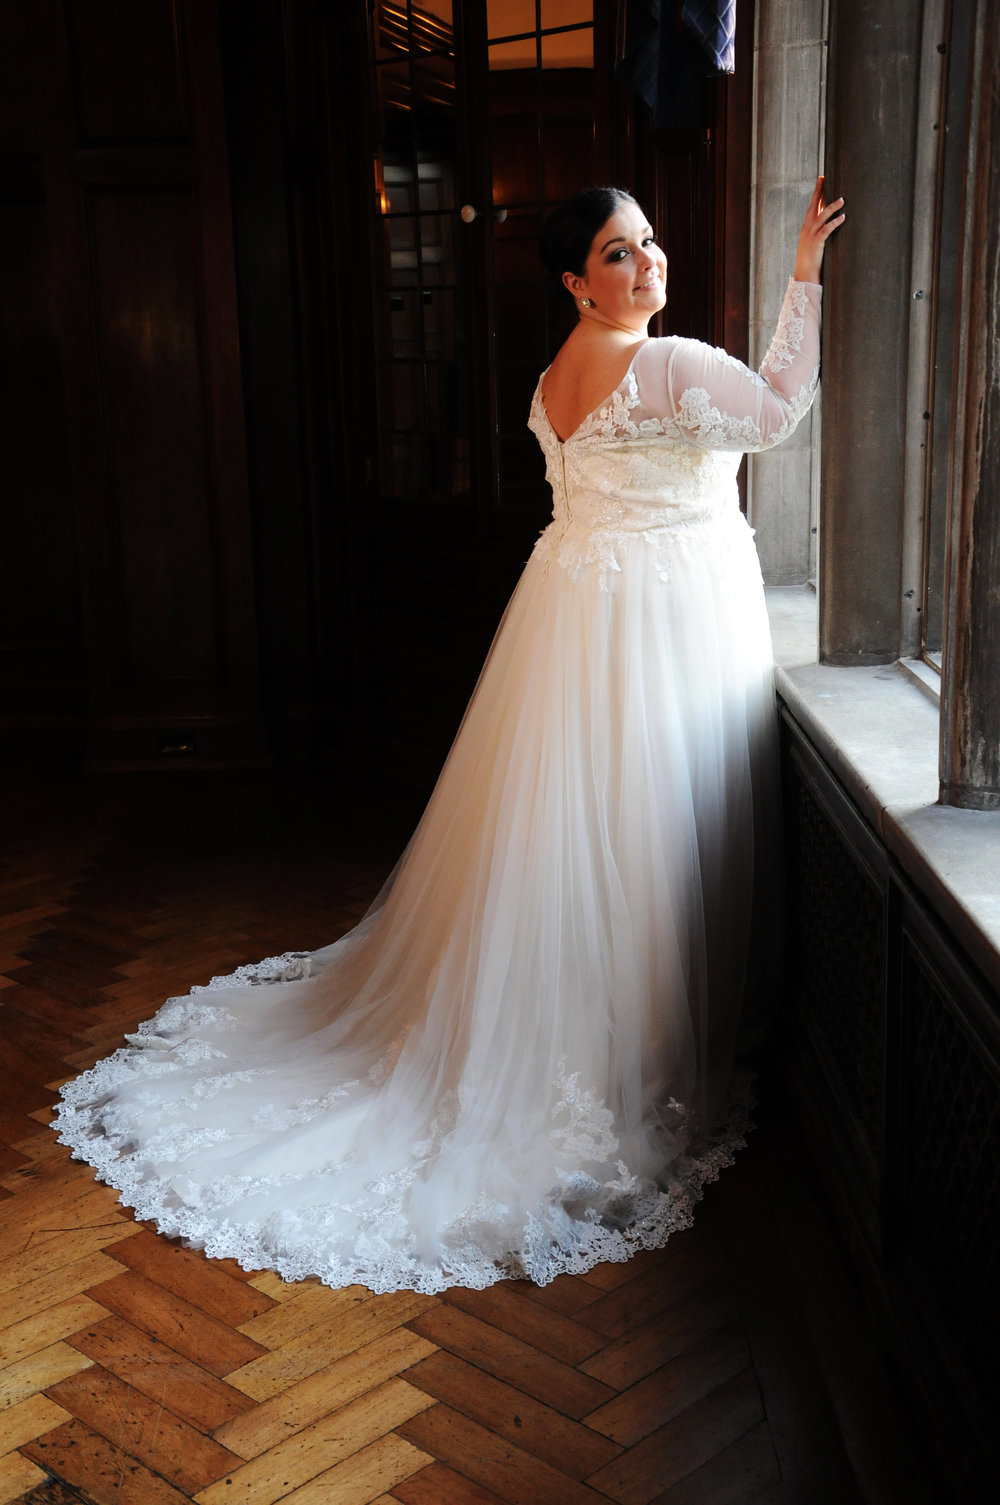 BridesbyYoung-IndianapolisIndianaSchaumburgChicagoIllinois-CurvyPlusSizeBridalStore-PrivateCollection-5.JPG